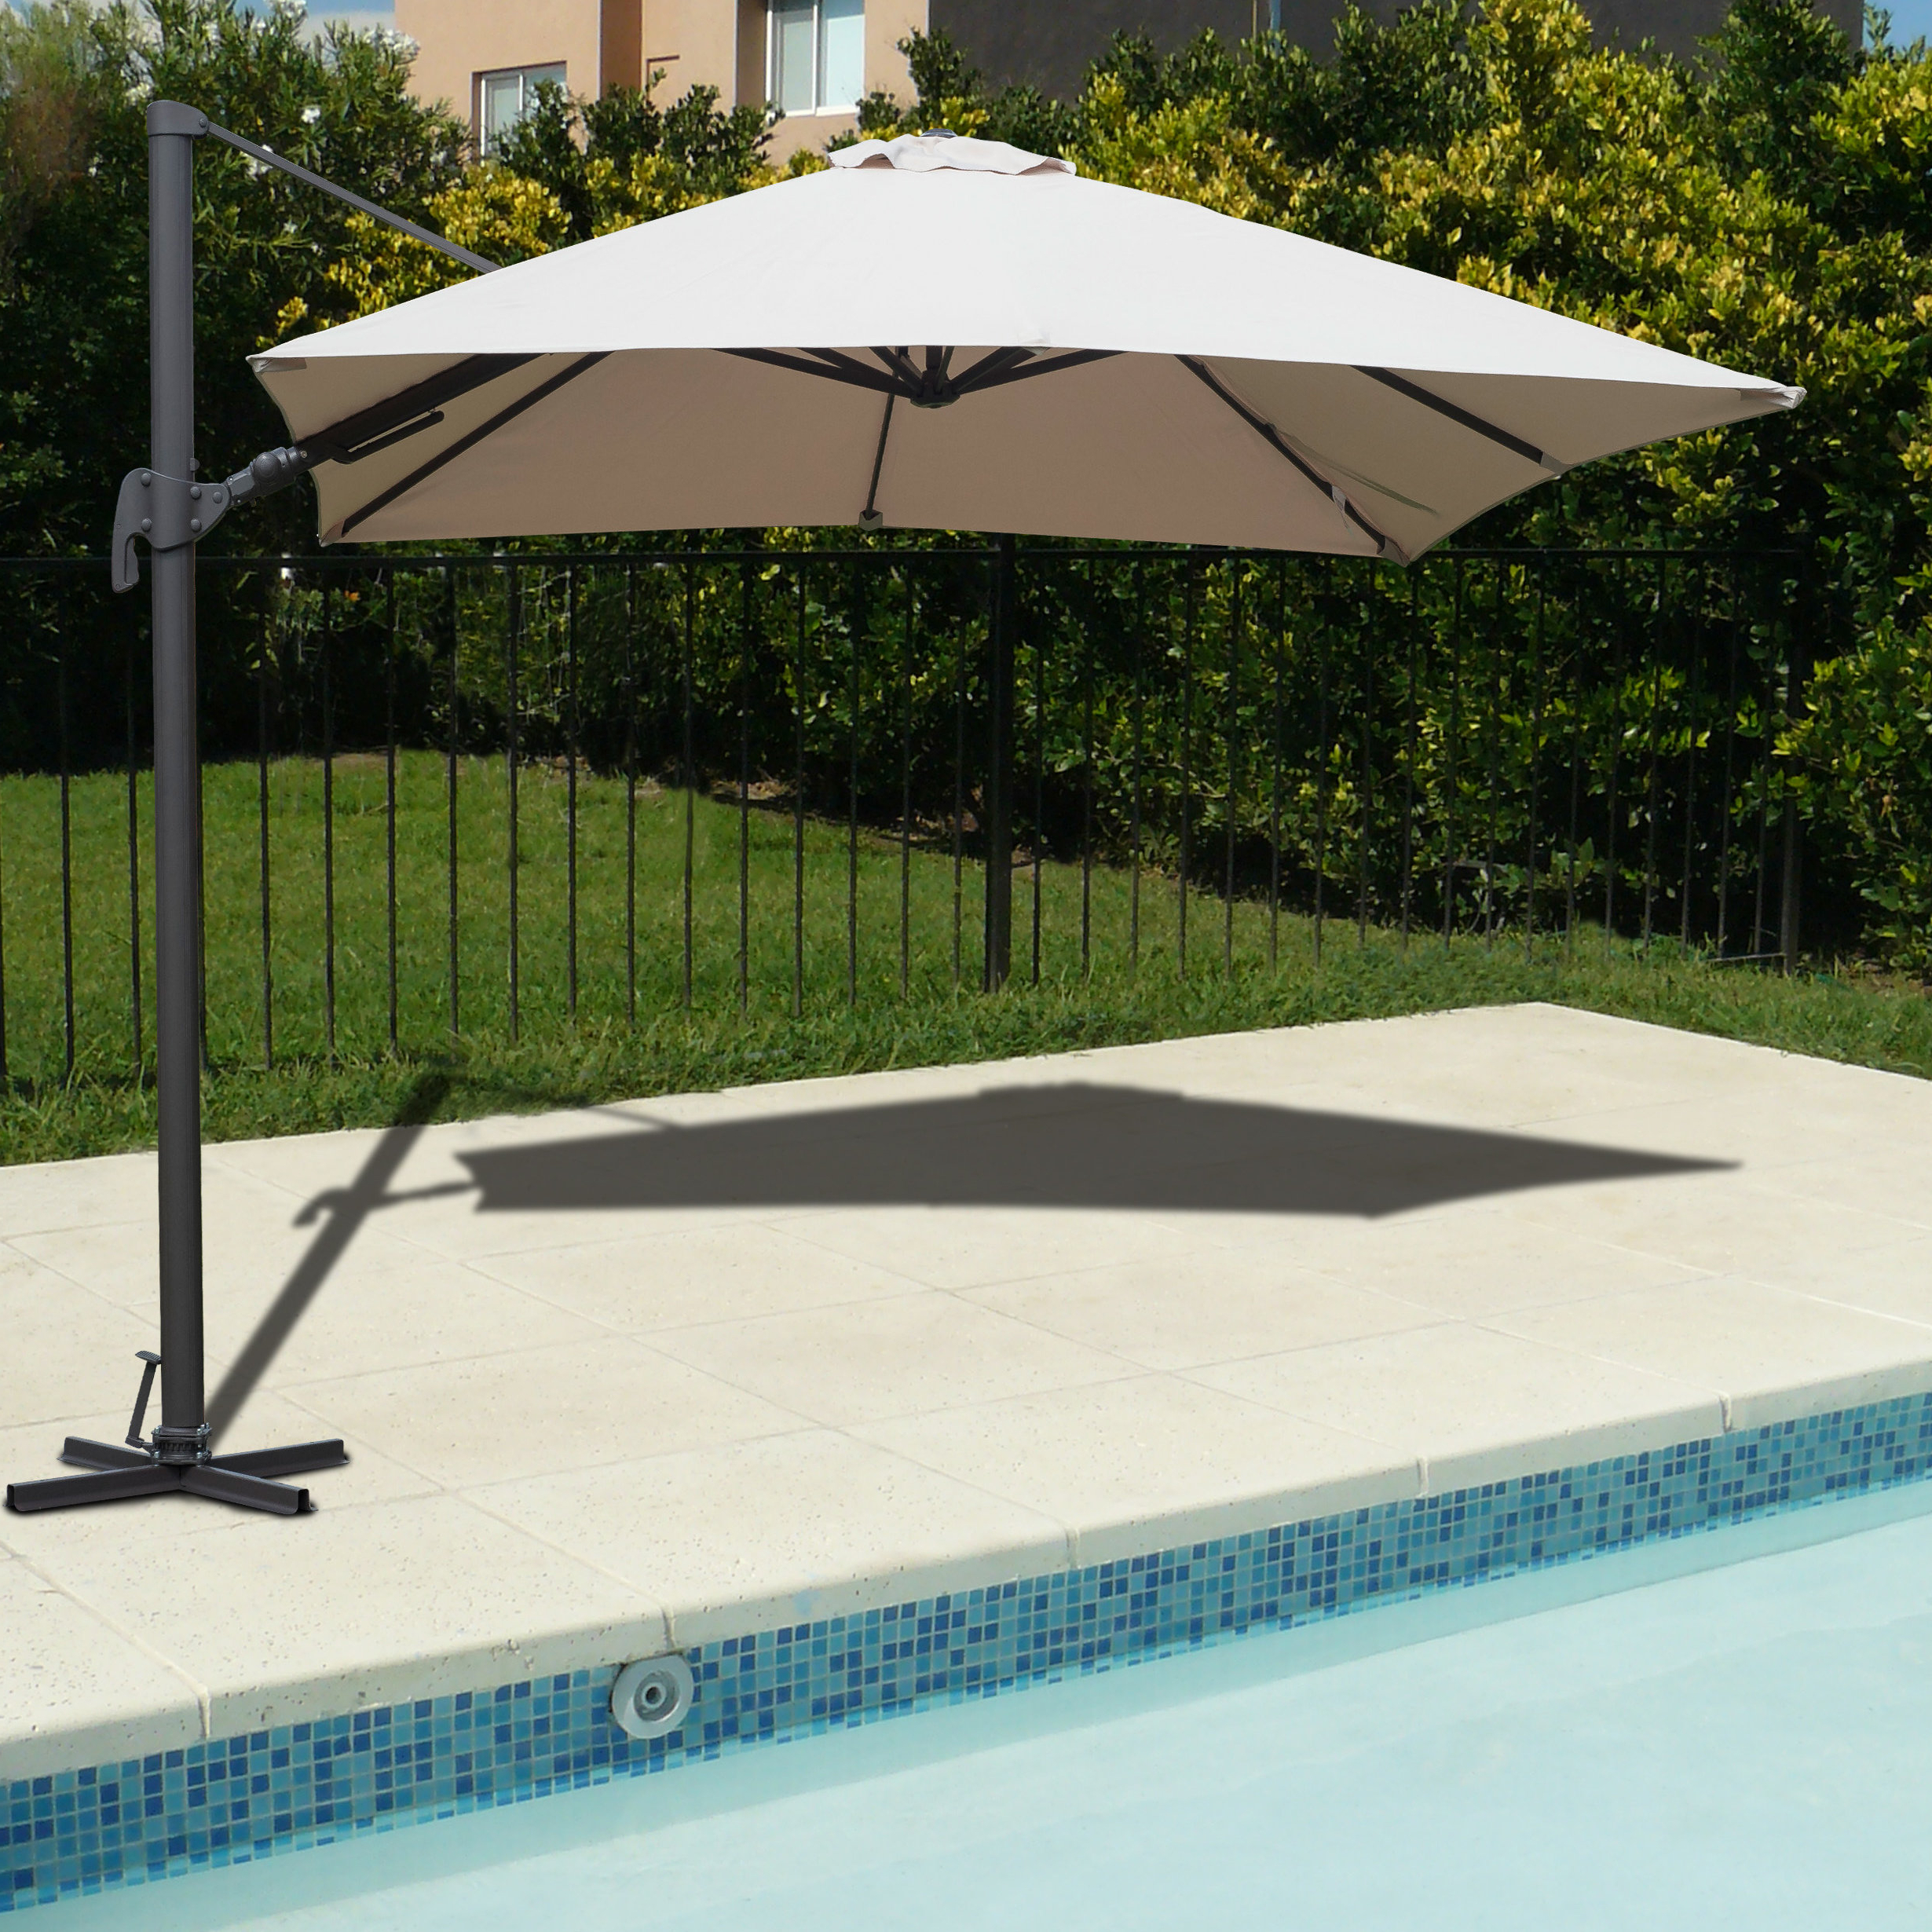 Brayden Studio Grote Liberty Aluminum Square Cantilever Umbrella In Latest Krystal Square Cantilever Sunbrella Umbrellas (View 18 of 20)